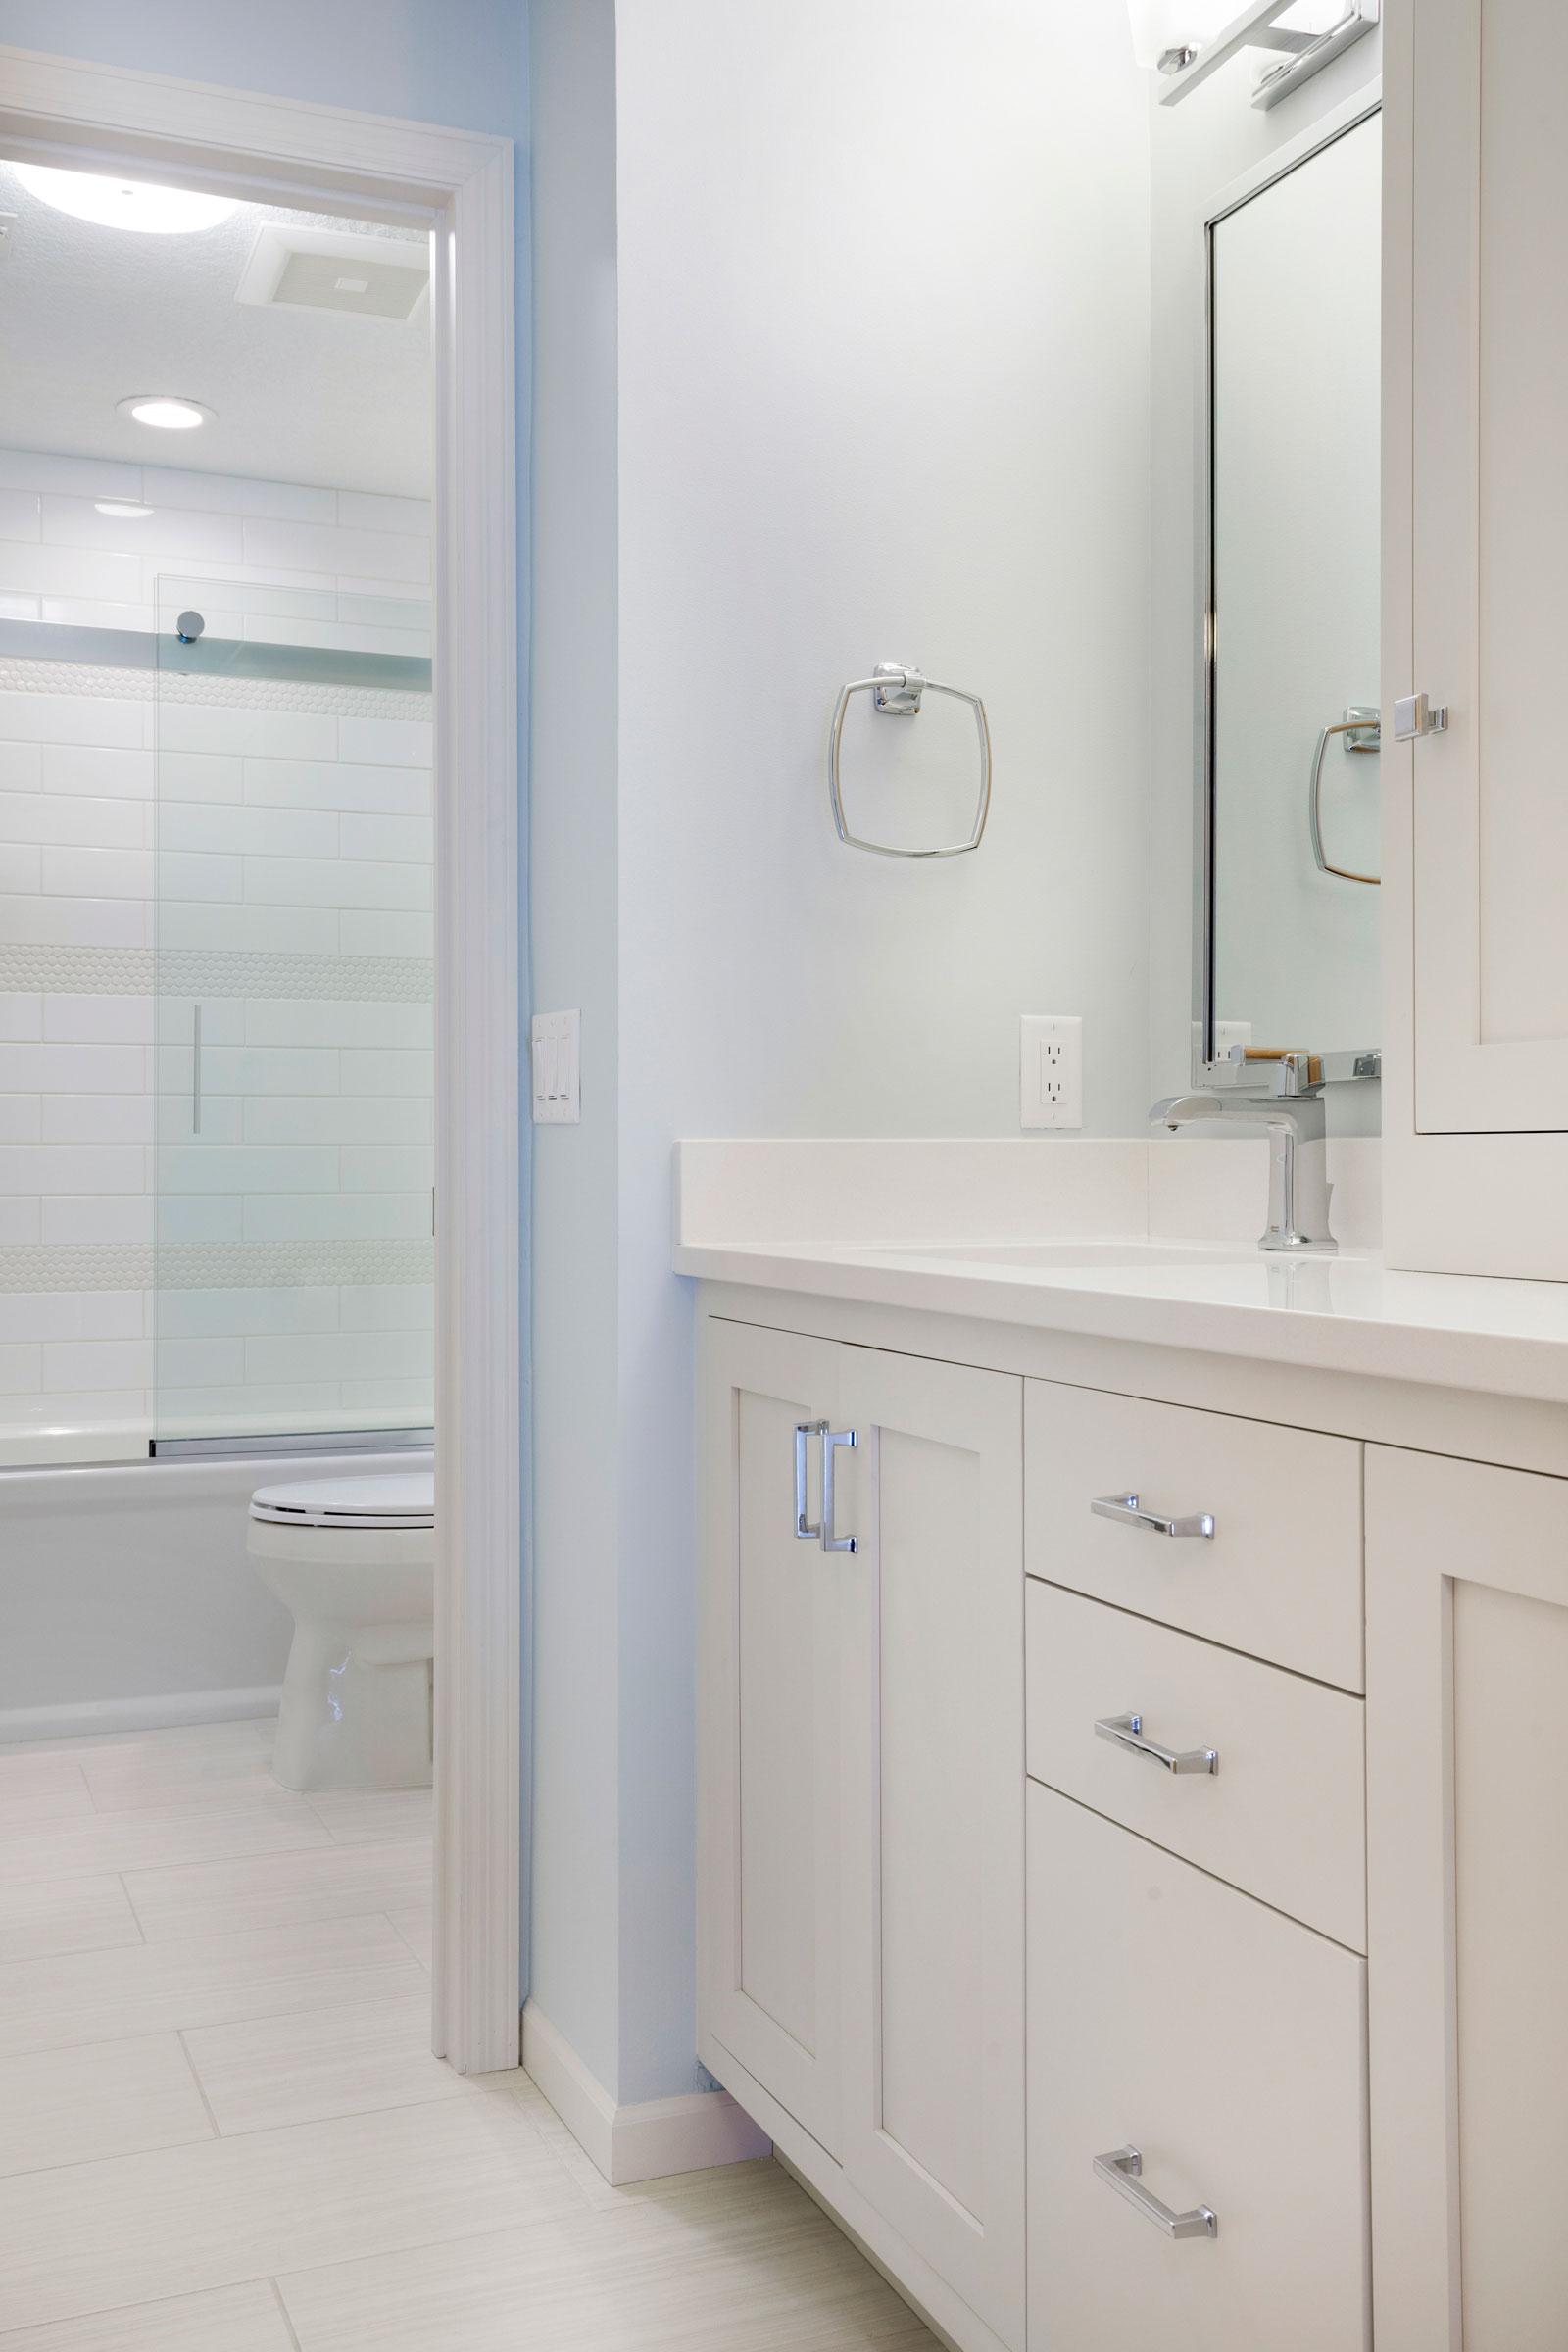 Bath design for teenage girl, light walls and vanity, silver hardware - Maven Design Studio